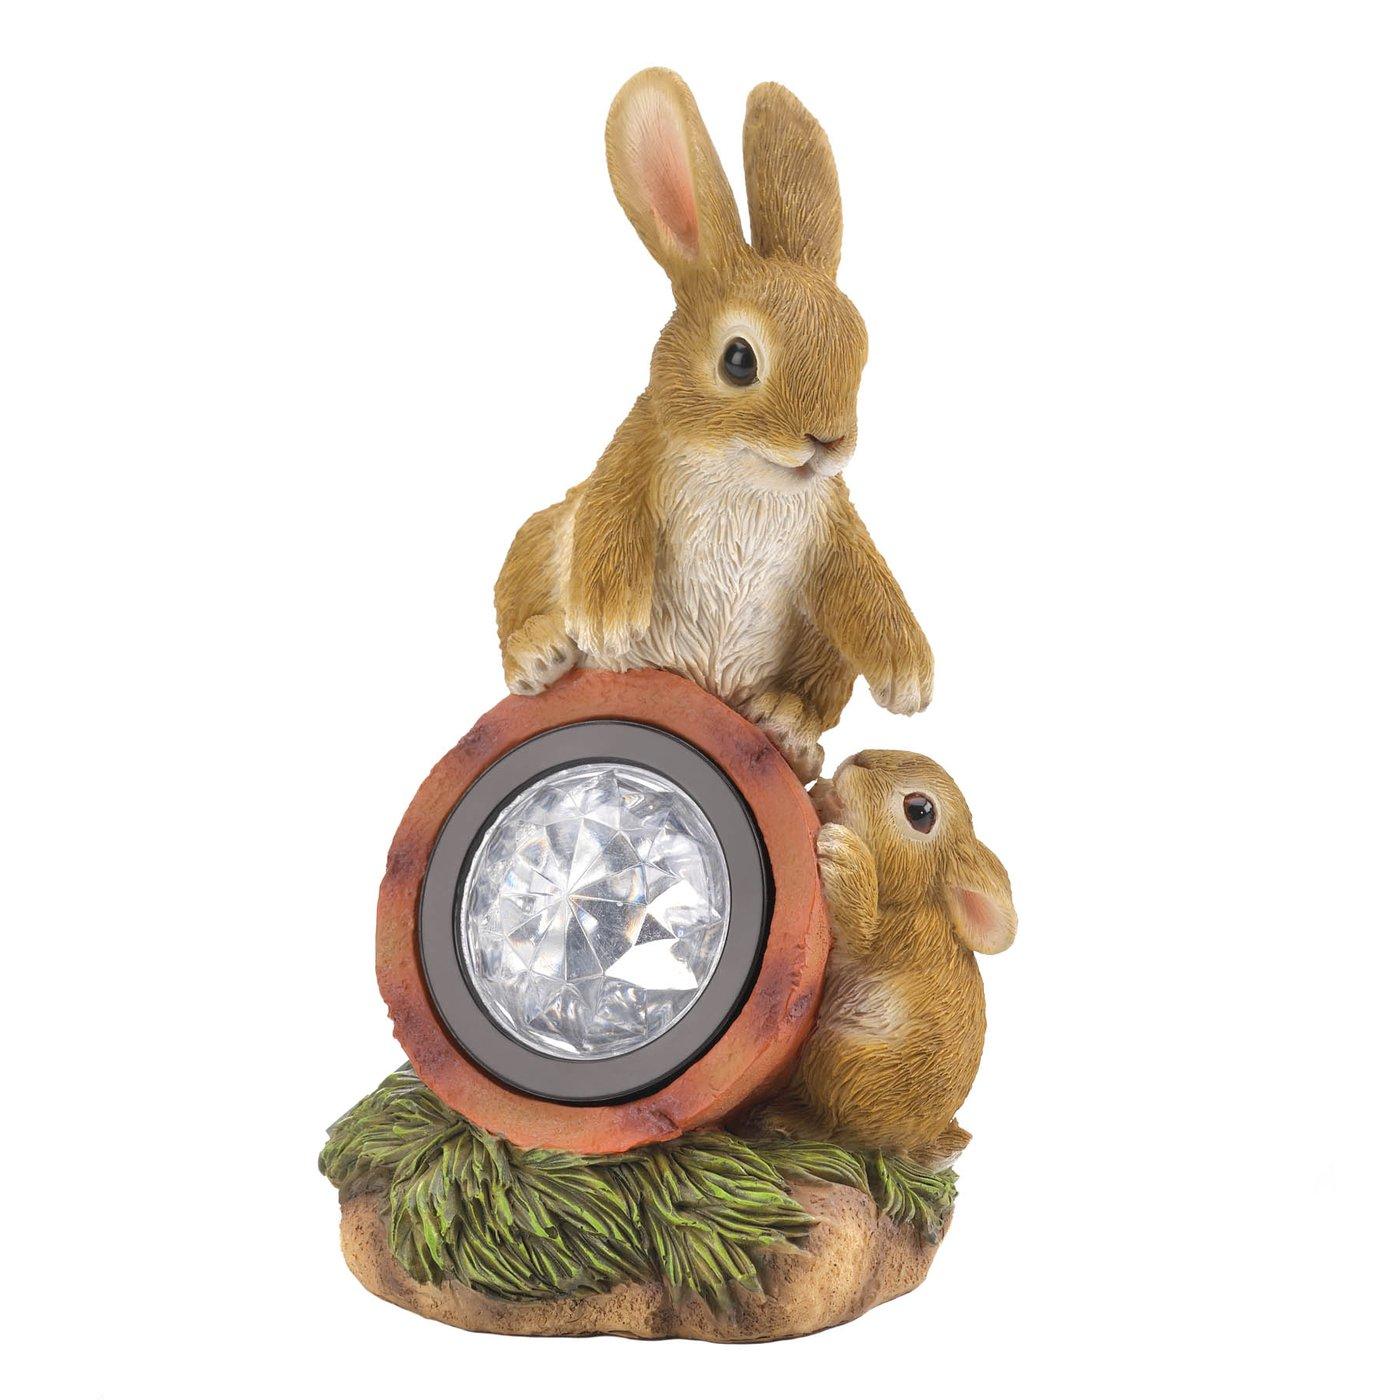 Rabbit W/Solar Light